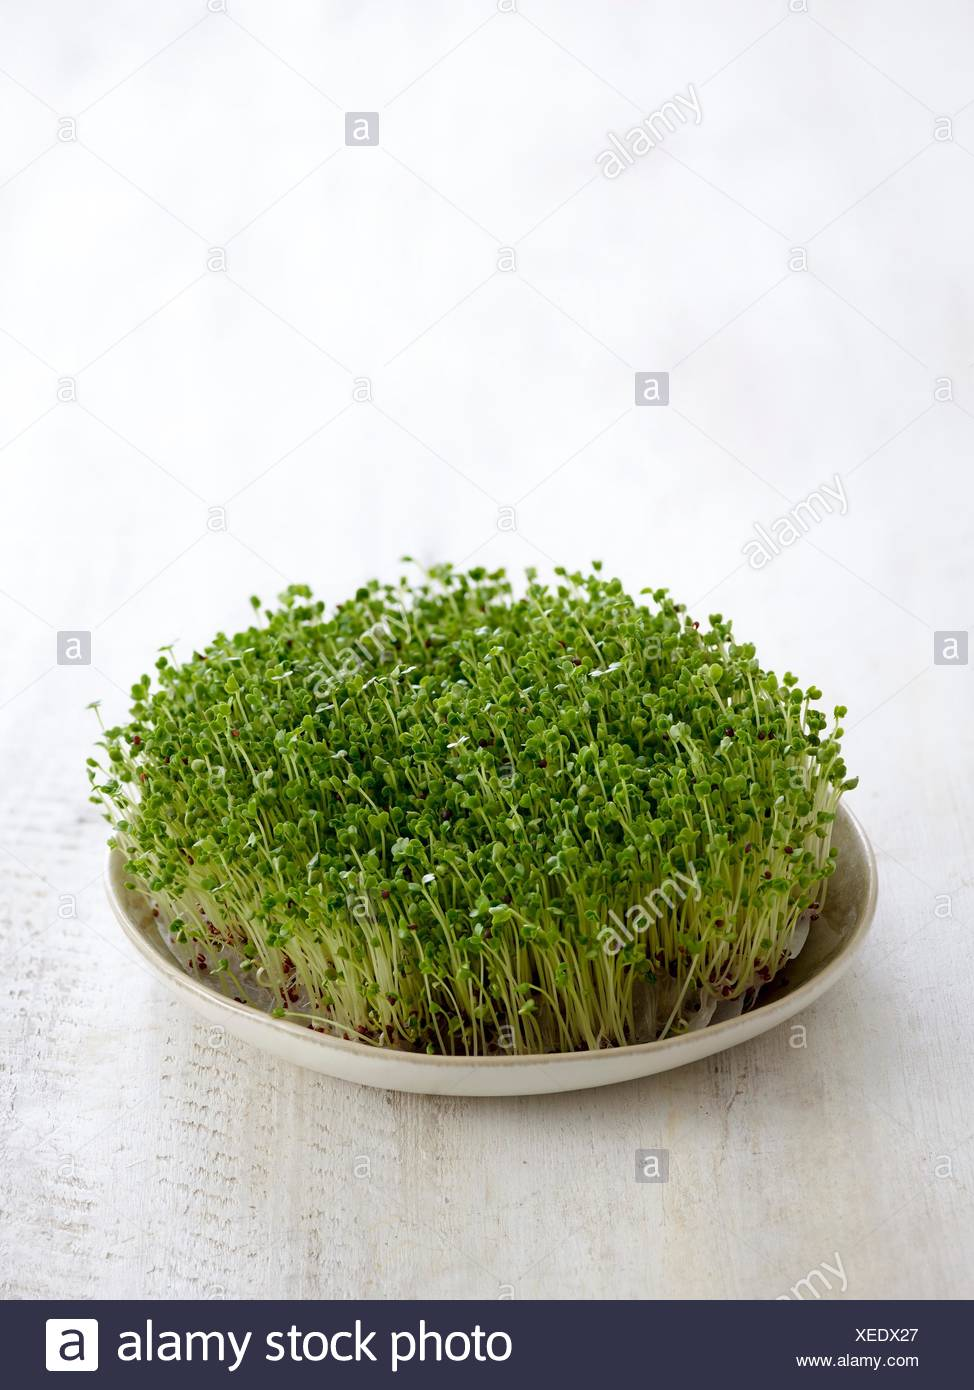 Sprouting brocoli dans un plat. Photo Stock